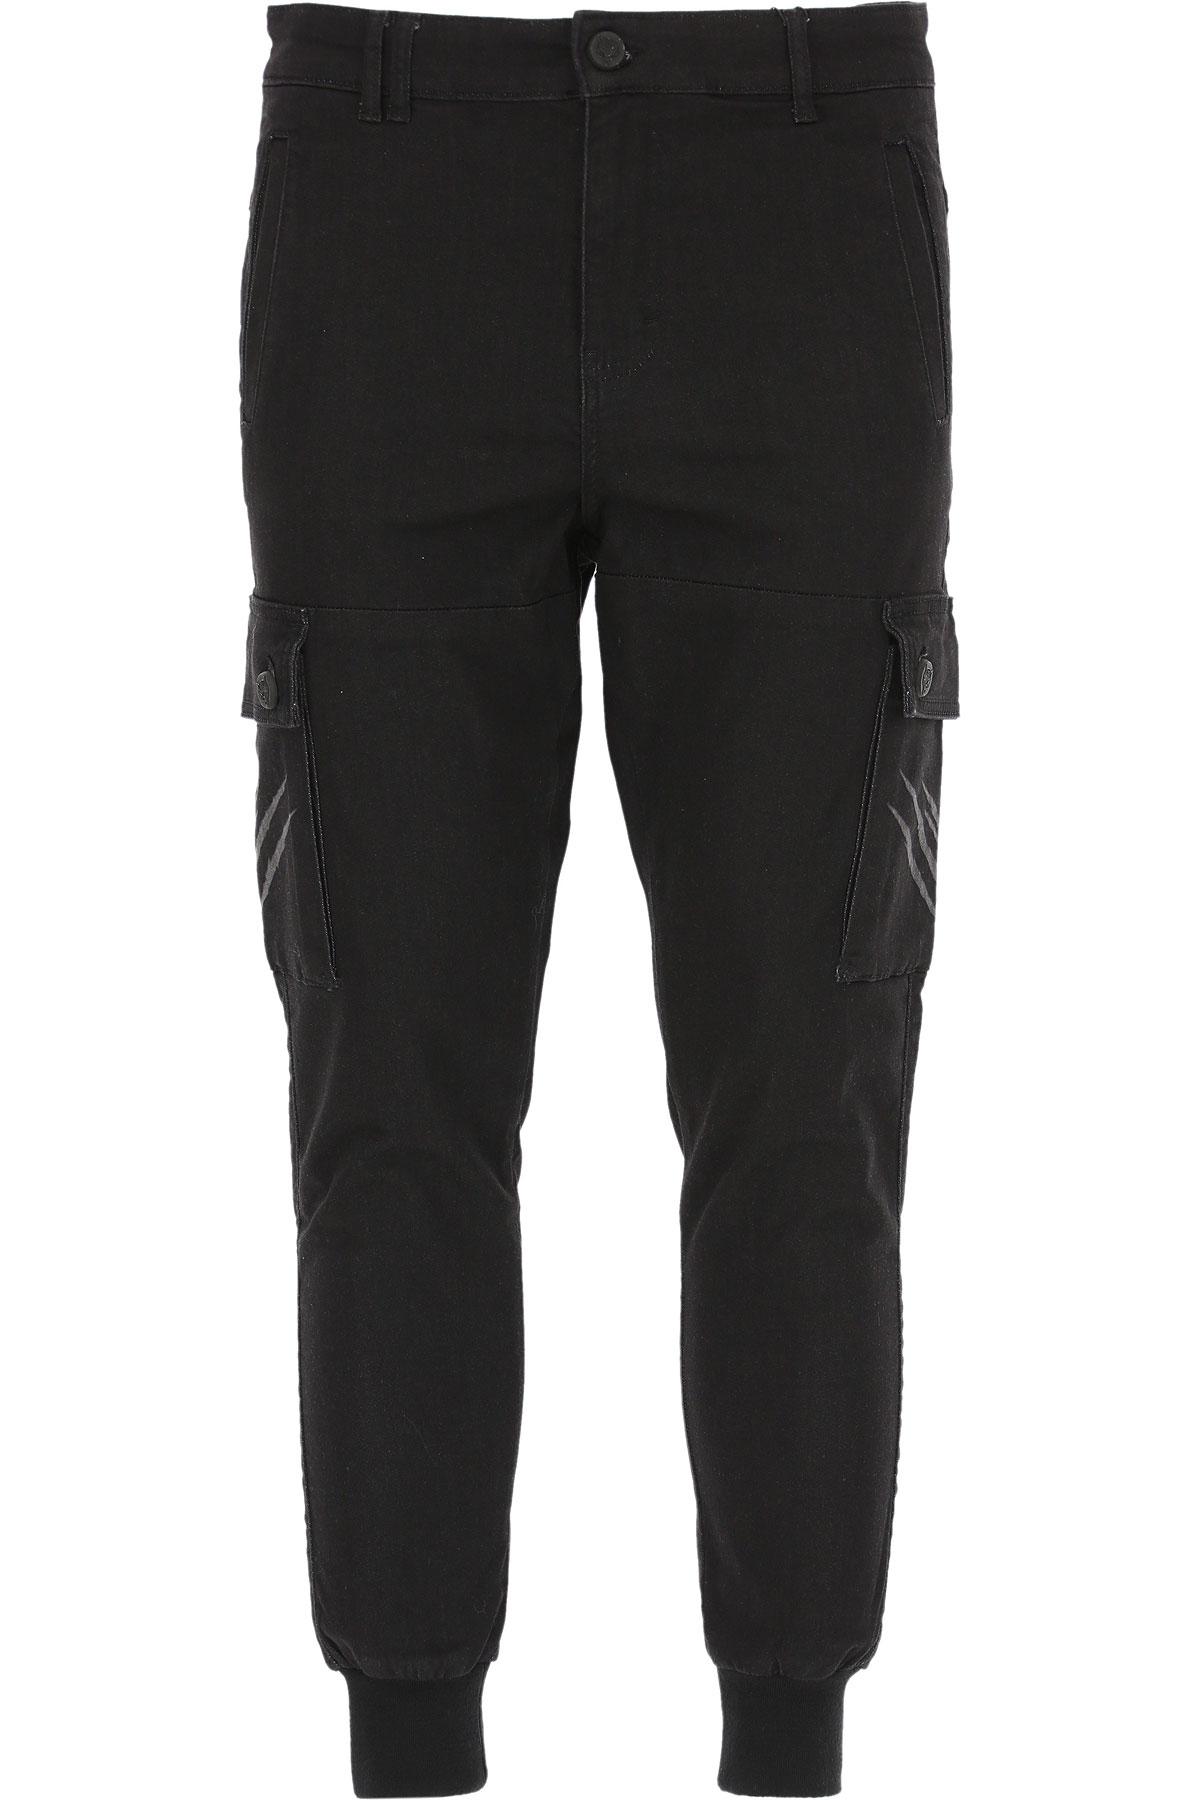 Philipp Plein Jeans On Sale, Black, Cotton, 2019, XL